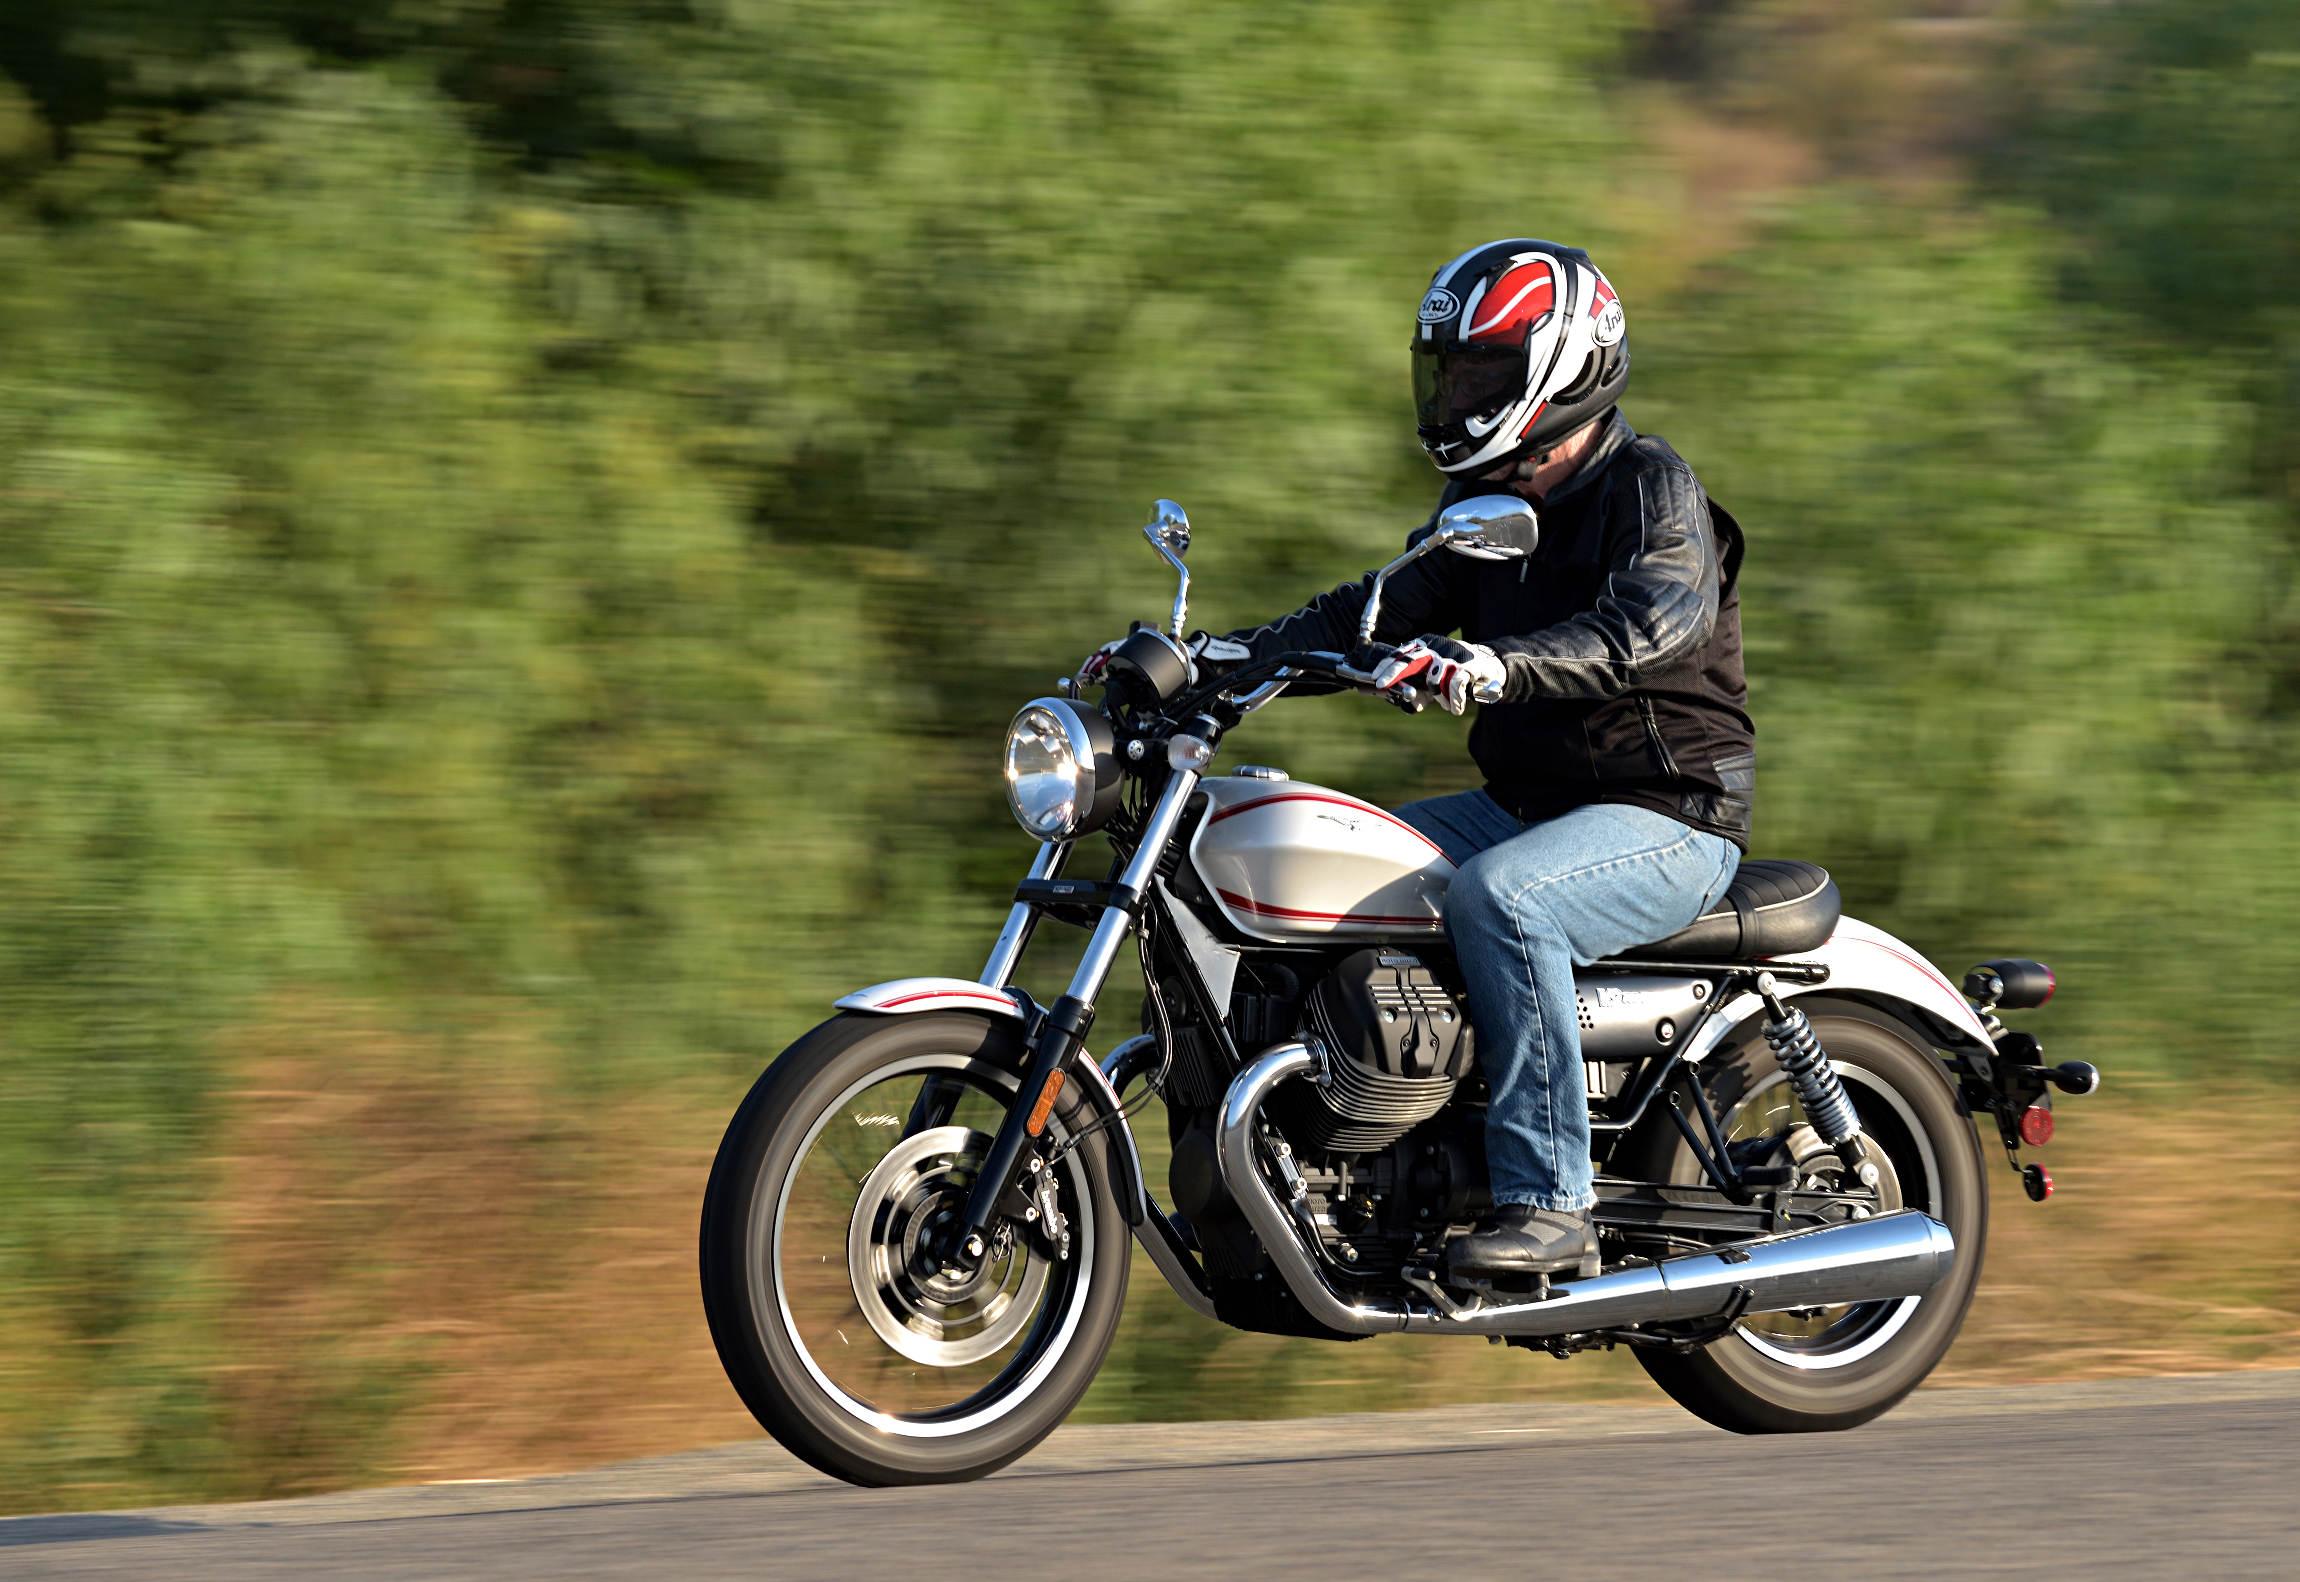 2017 moto guzzi v9 roamer md ride review motorcycle news editorials. Black Bedroom Furniture Sets. Home Design Ideas